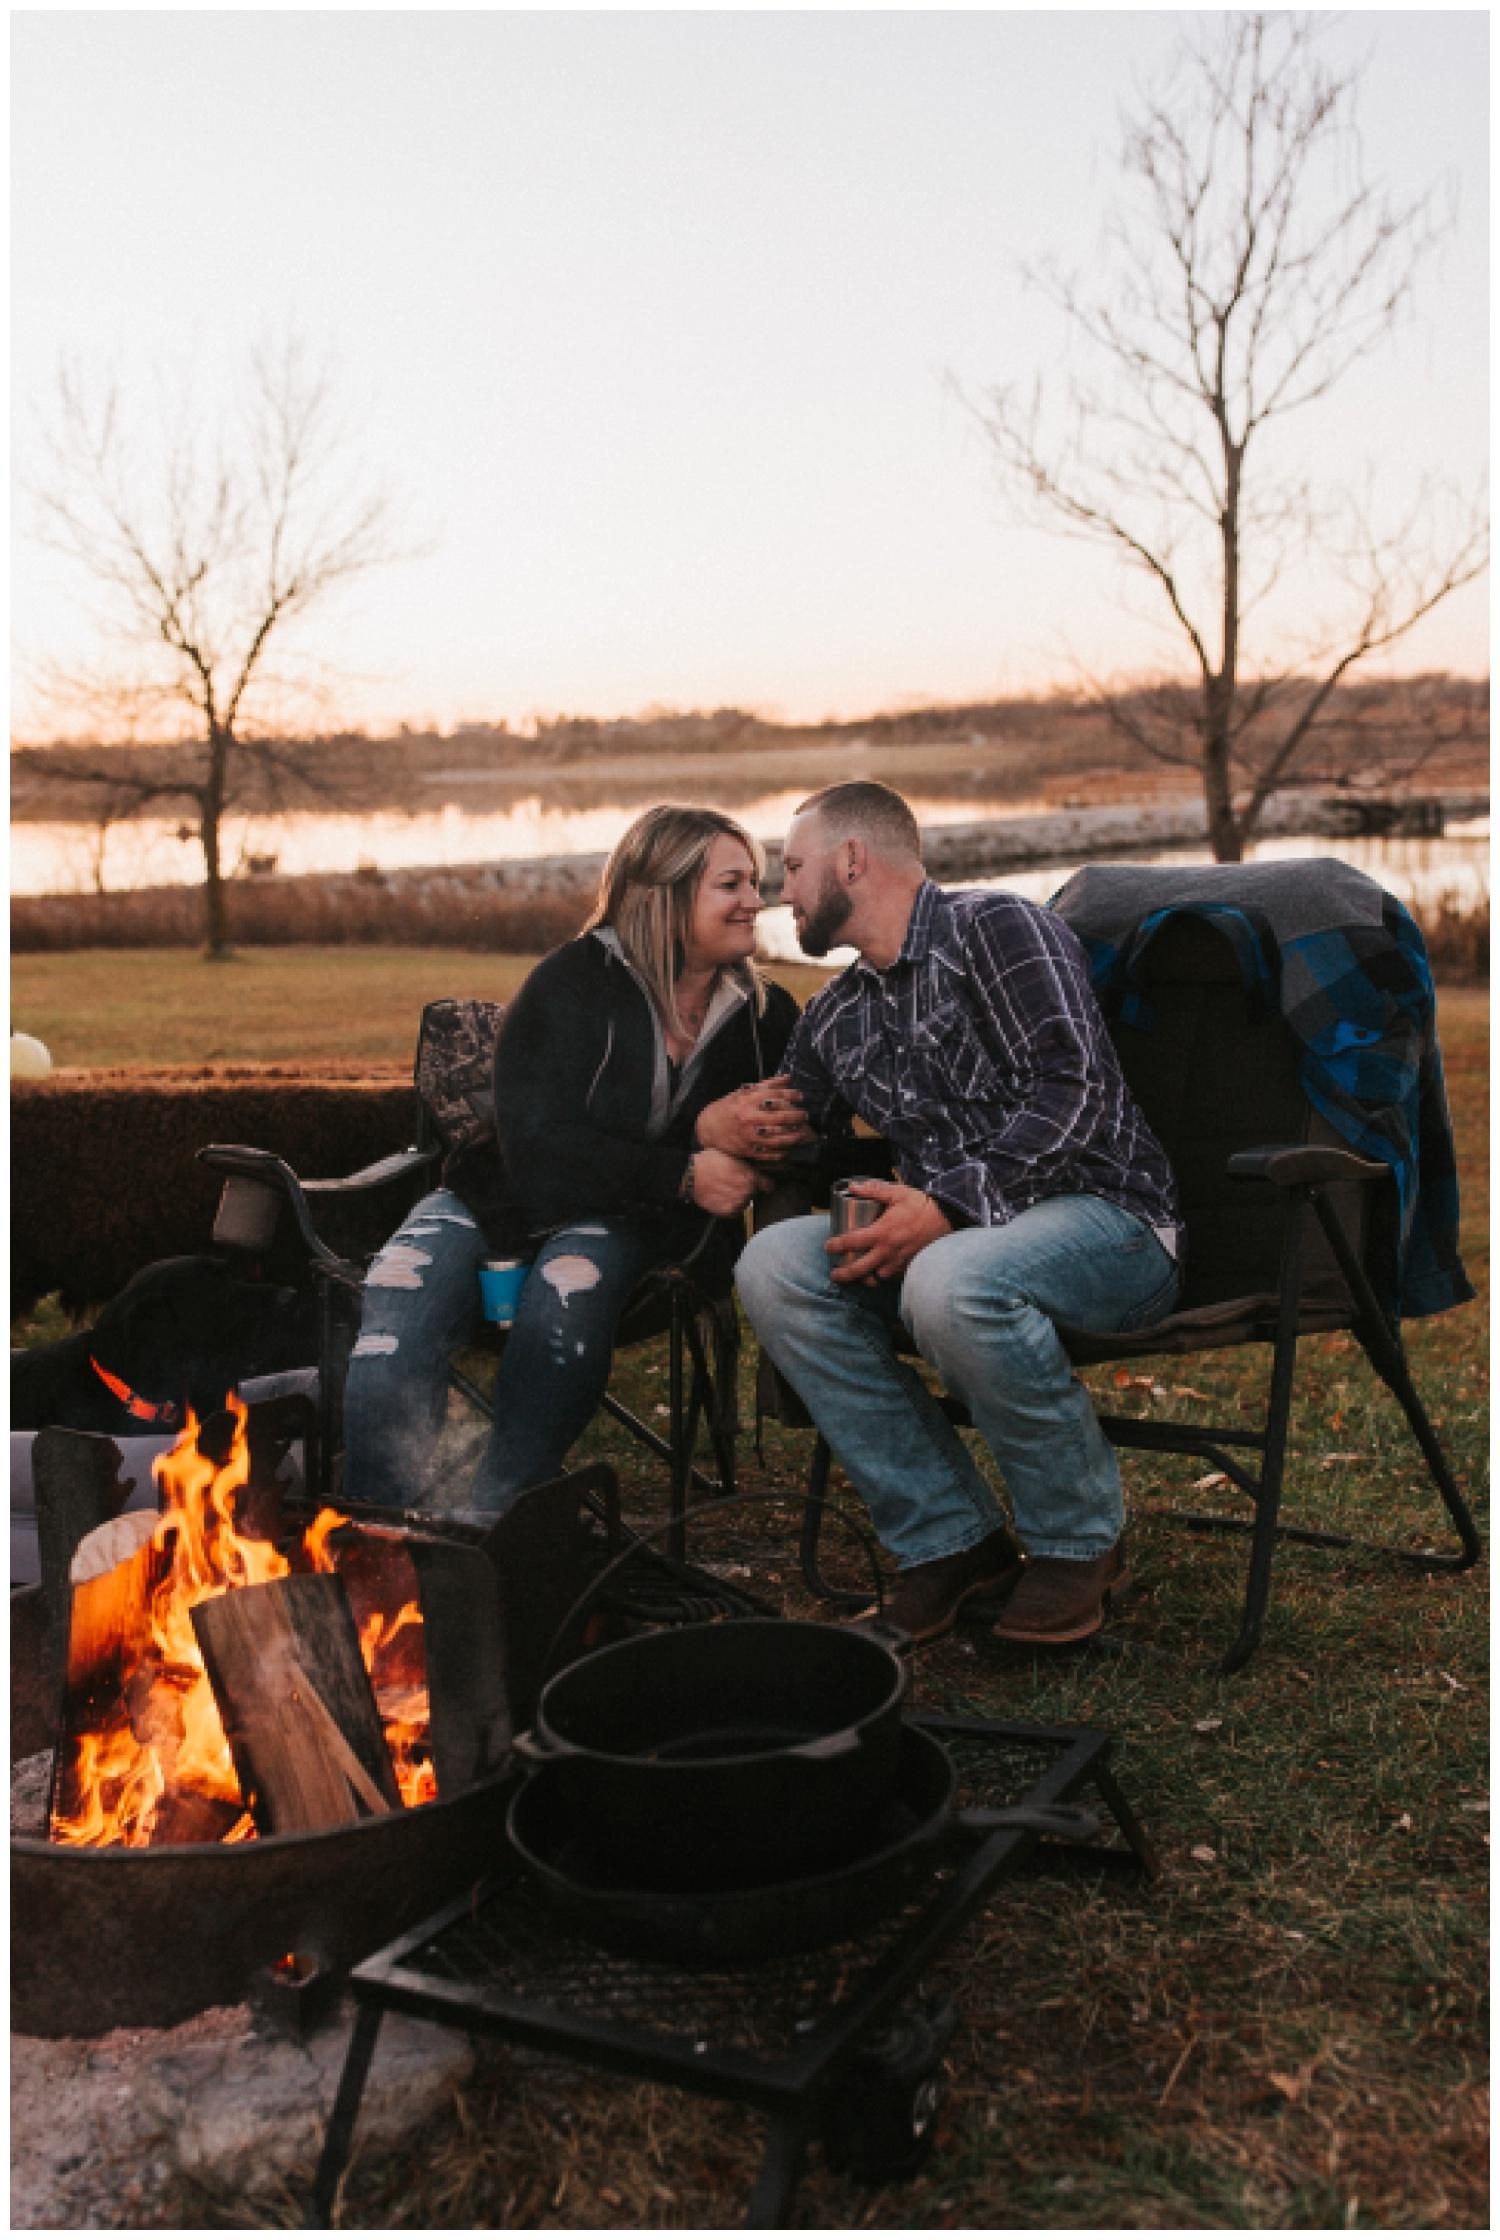 cozy_campfire_campsite_engagement_anniversary_session_nebraska_photographer_haley_chicoine_adventureous_wedding_0033.jpg